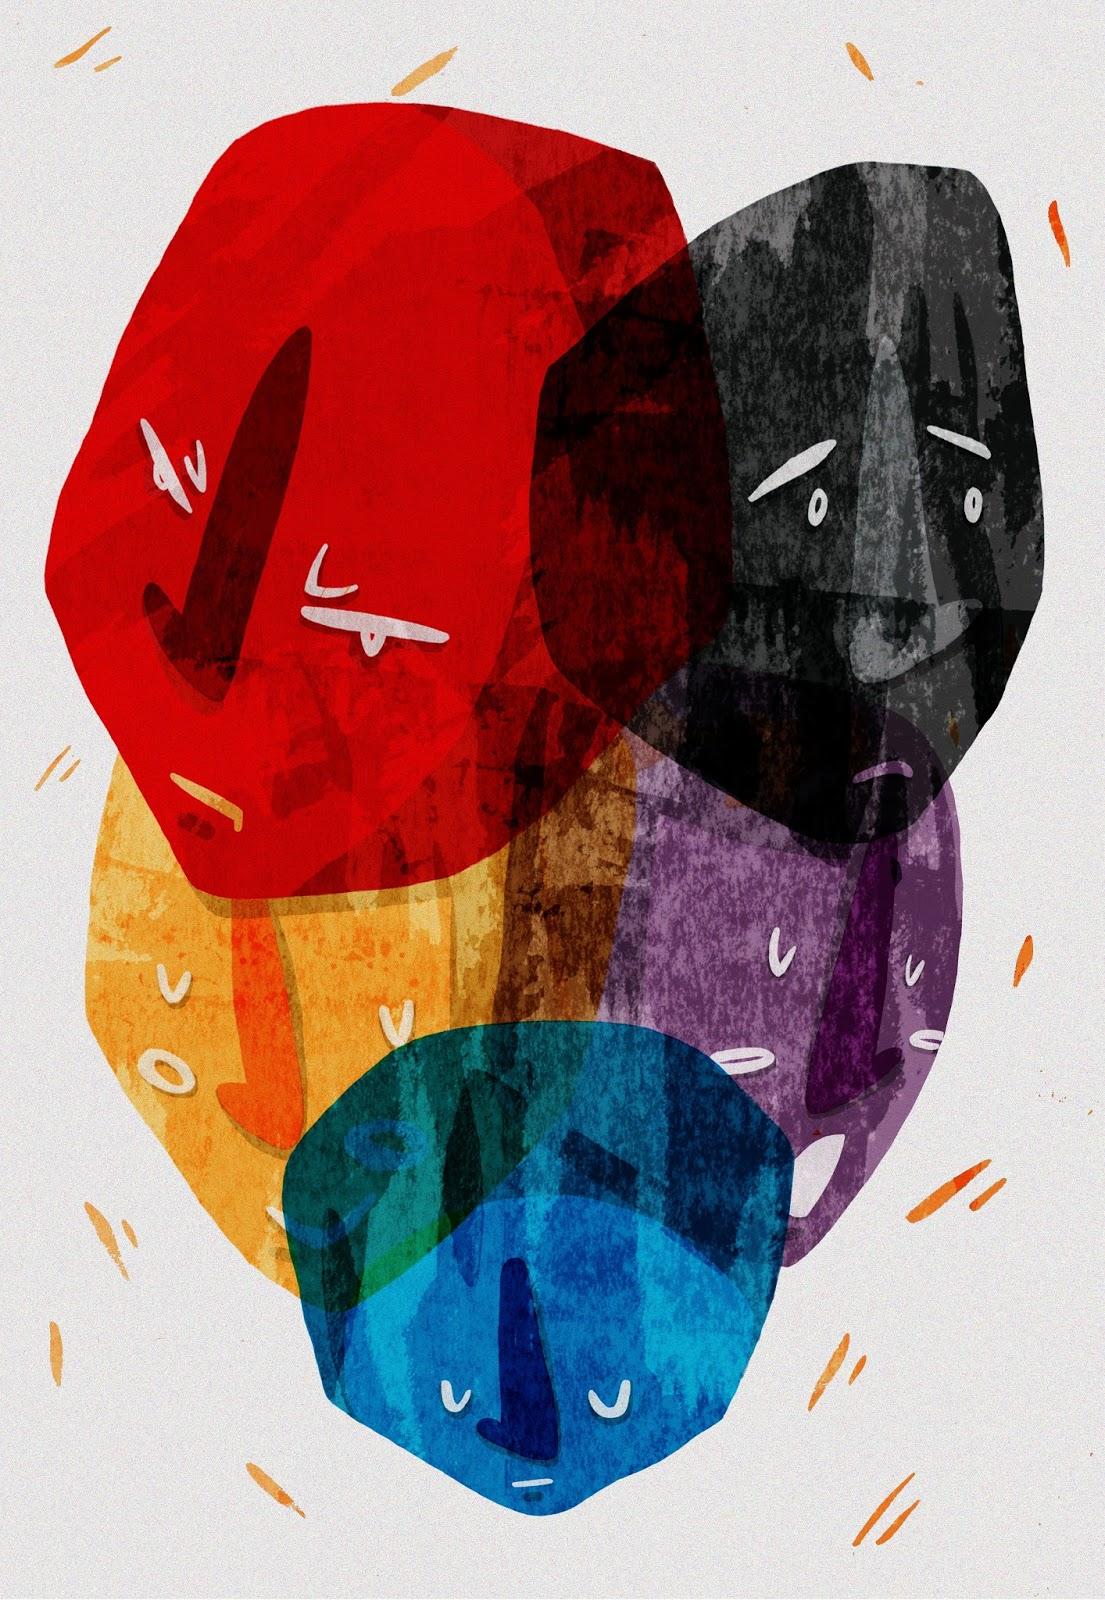 Rachel Tunstall Illustration: Editorial: Schizophrenia